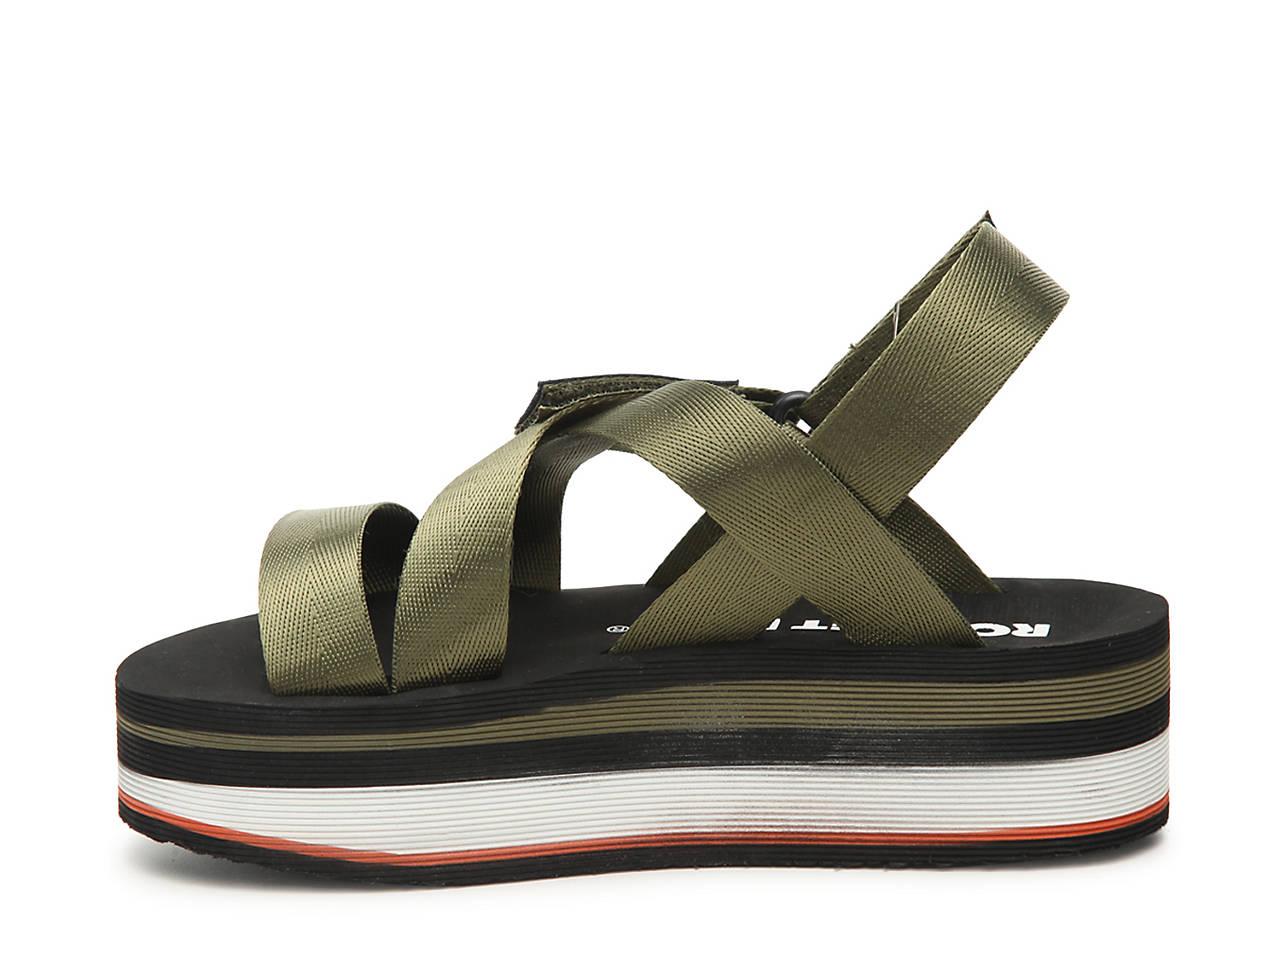 d3fd1b2dbbe6 Rocket Dog Jarvis Platform Sandal Women s Shoes